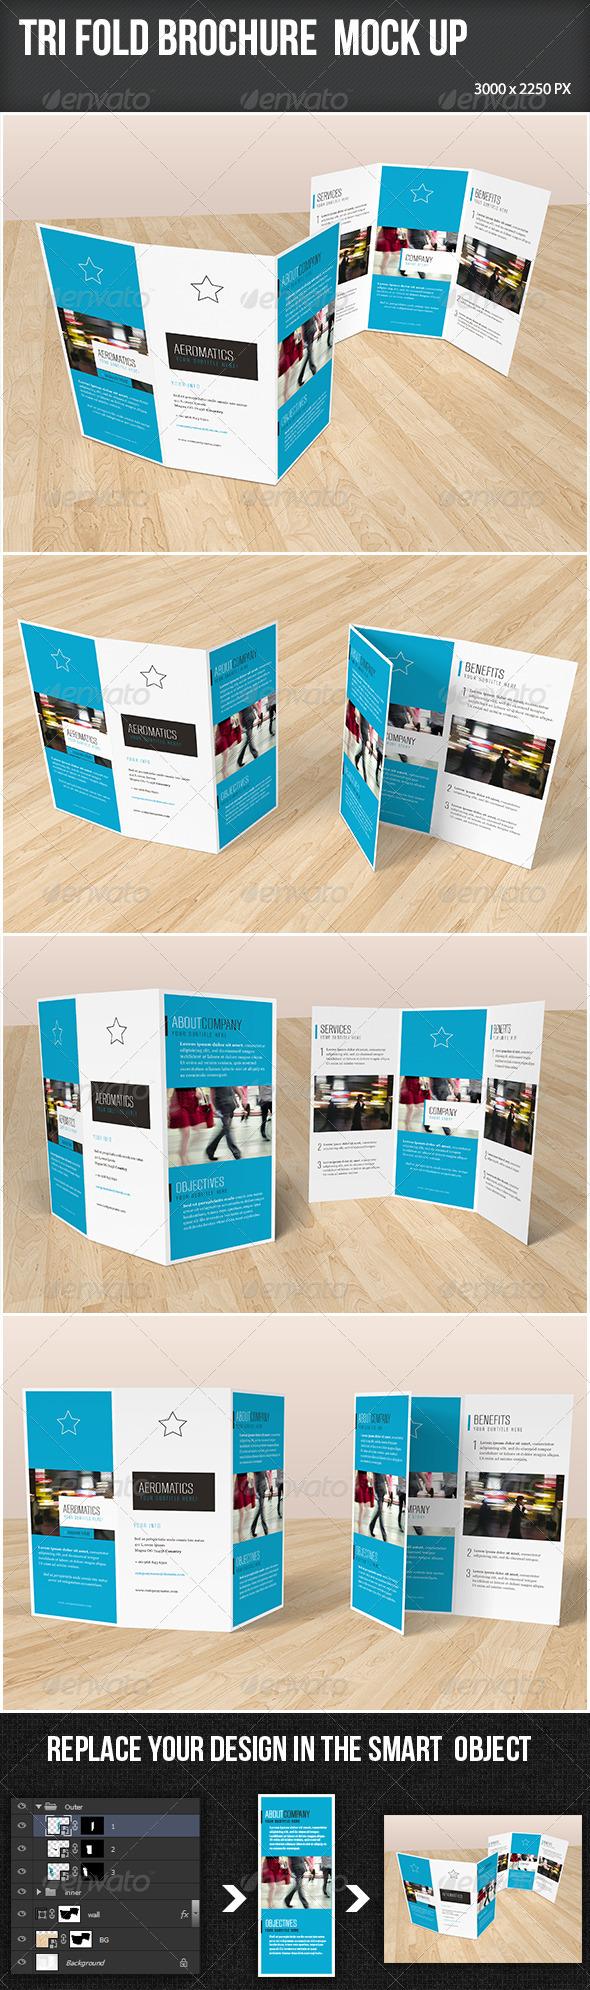 brochure-mockup